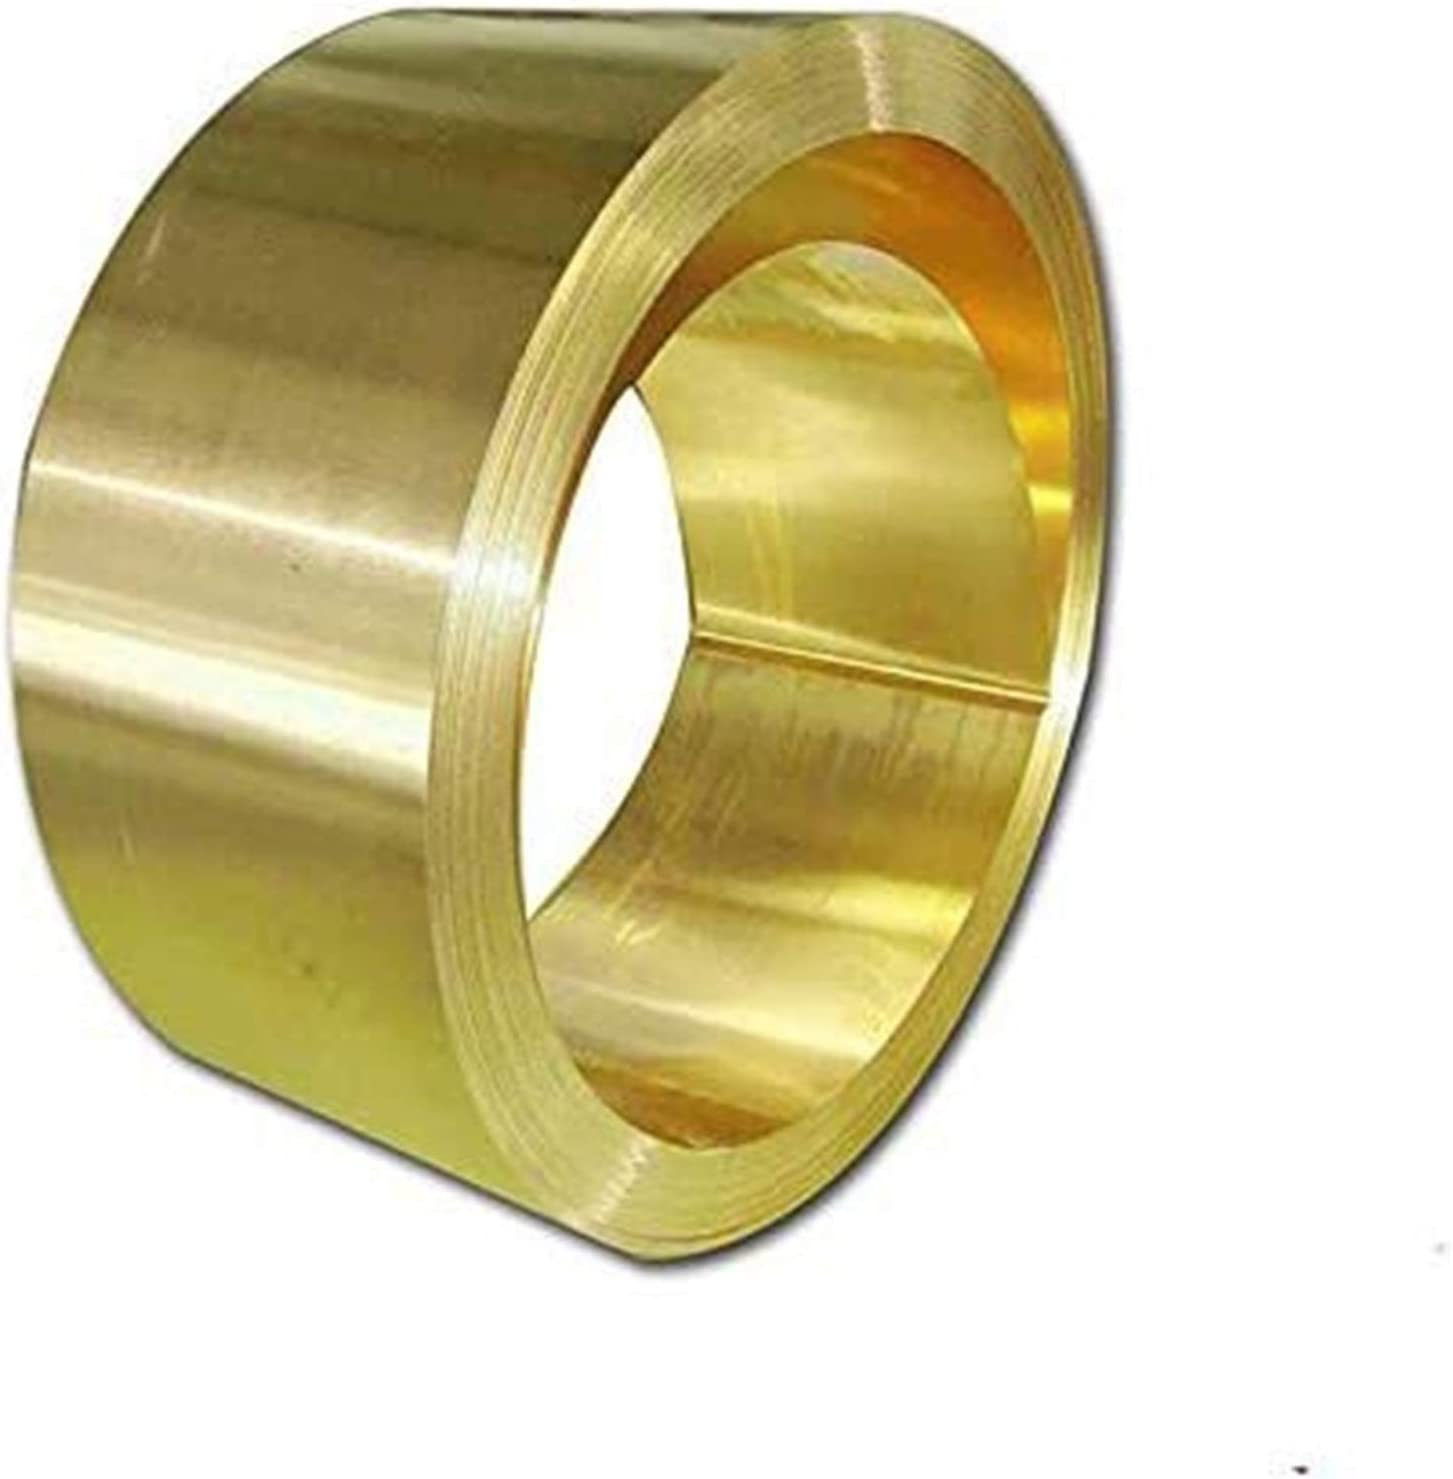 Wzqwzj Copper Sheet Metal Limited time cheap sale Spasm price M - Brass Scraps